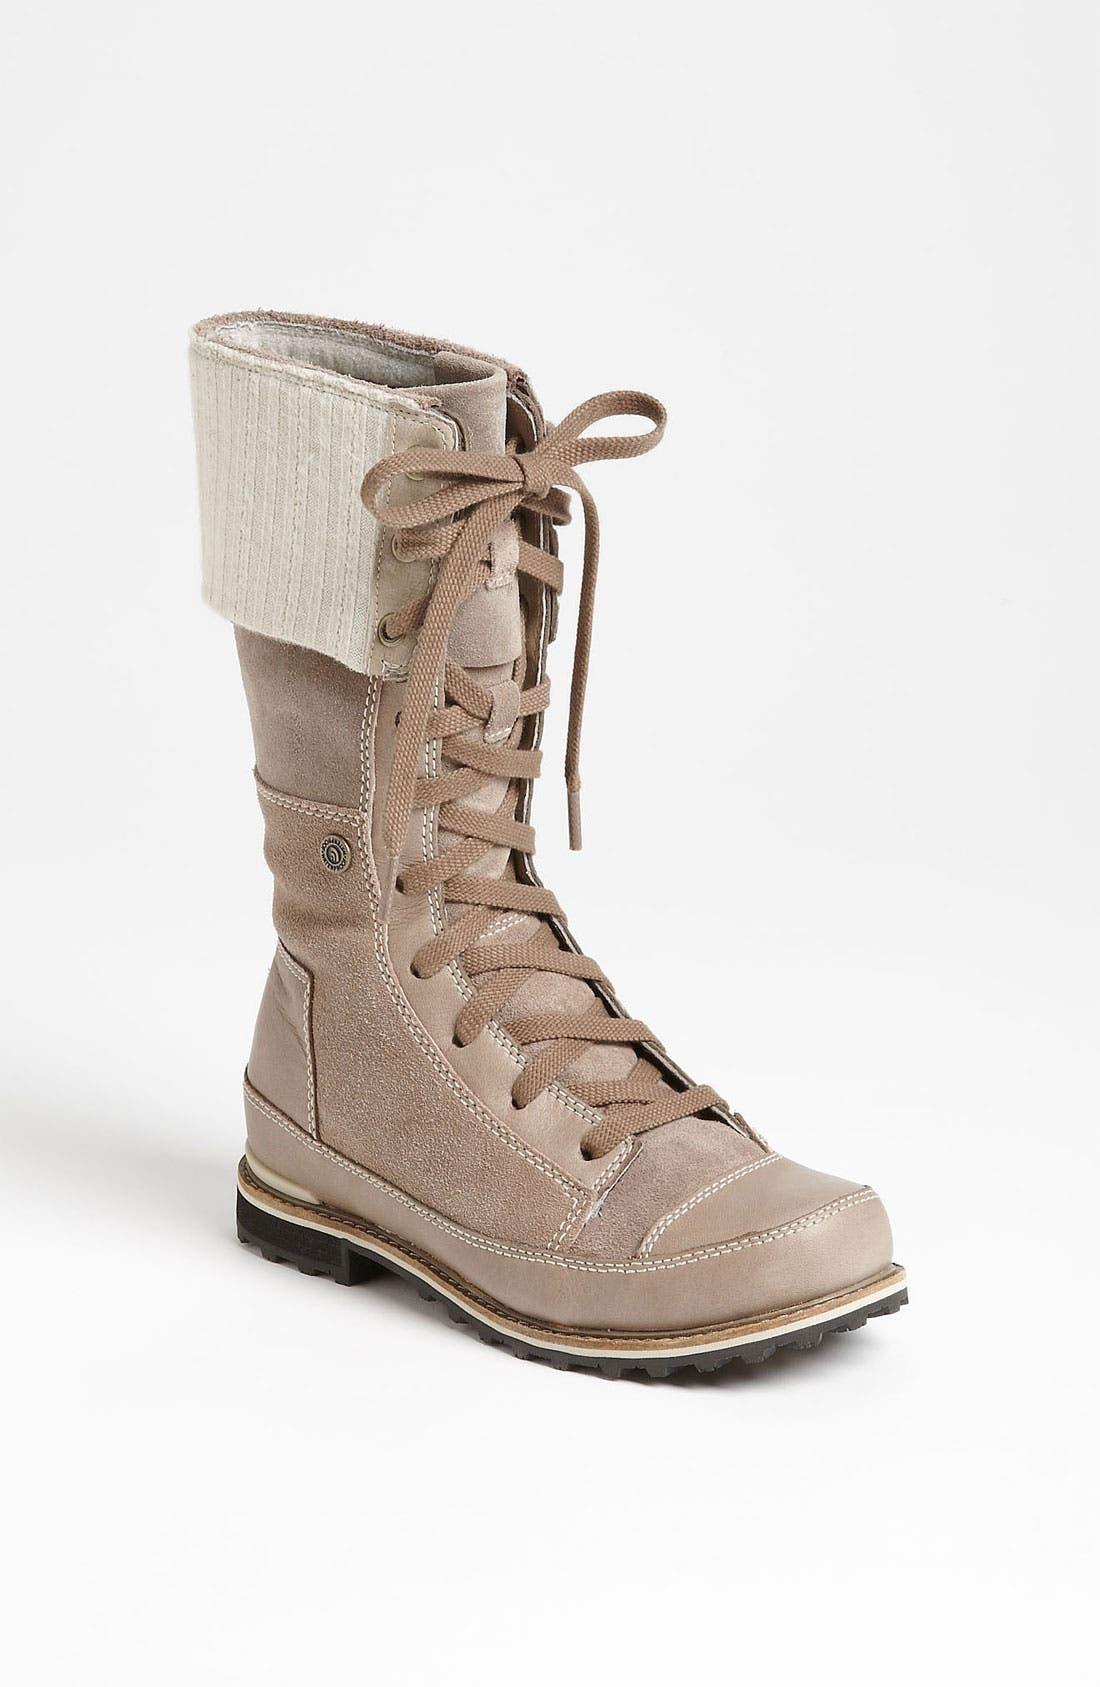 Main Image - The North Face 'Snowtropolis' Boot